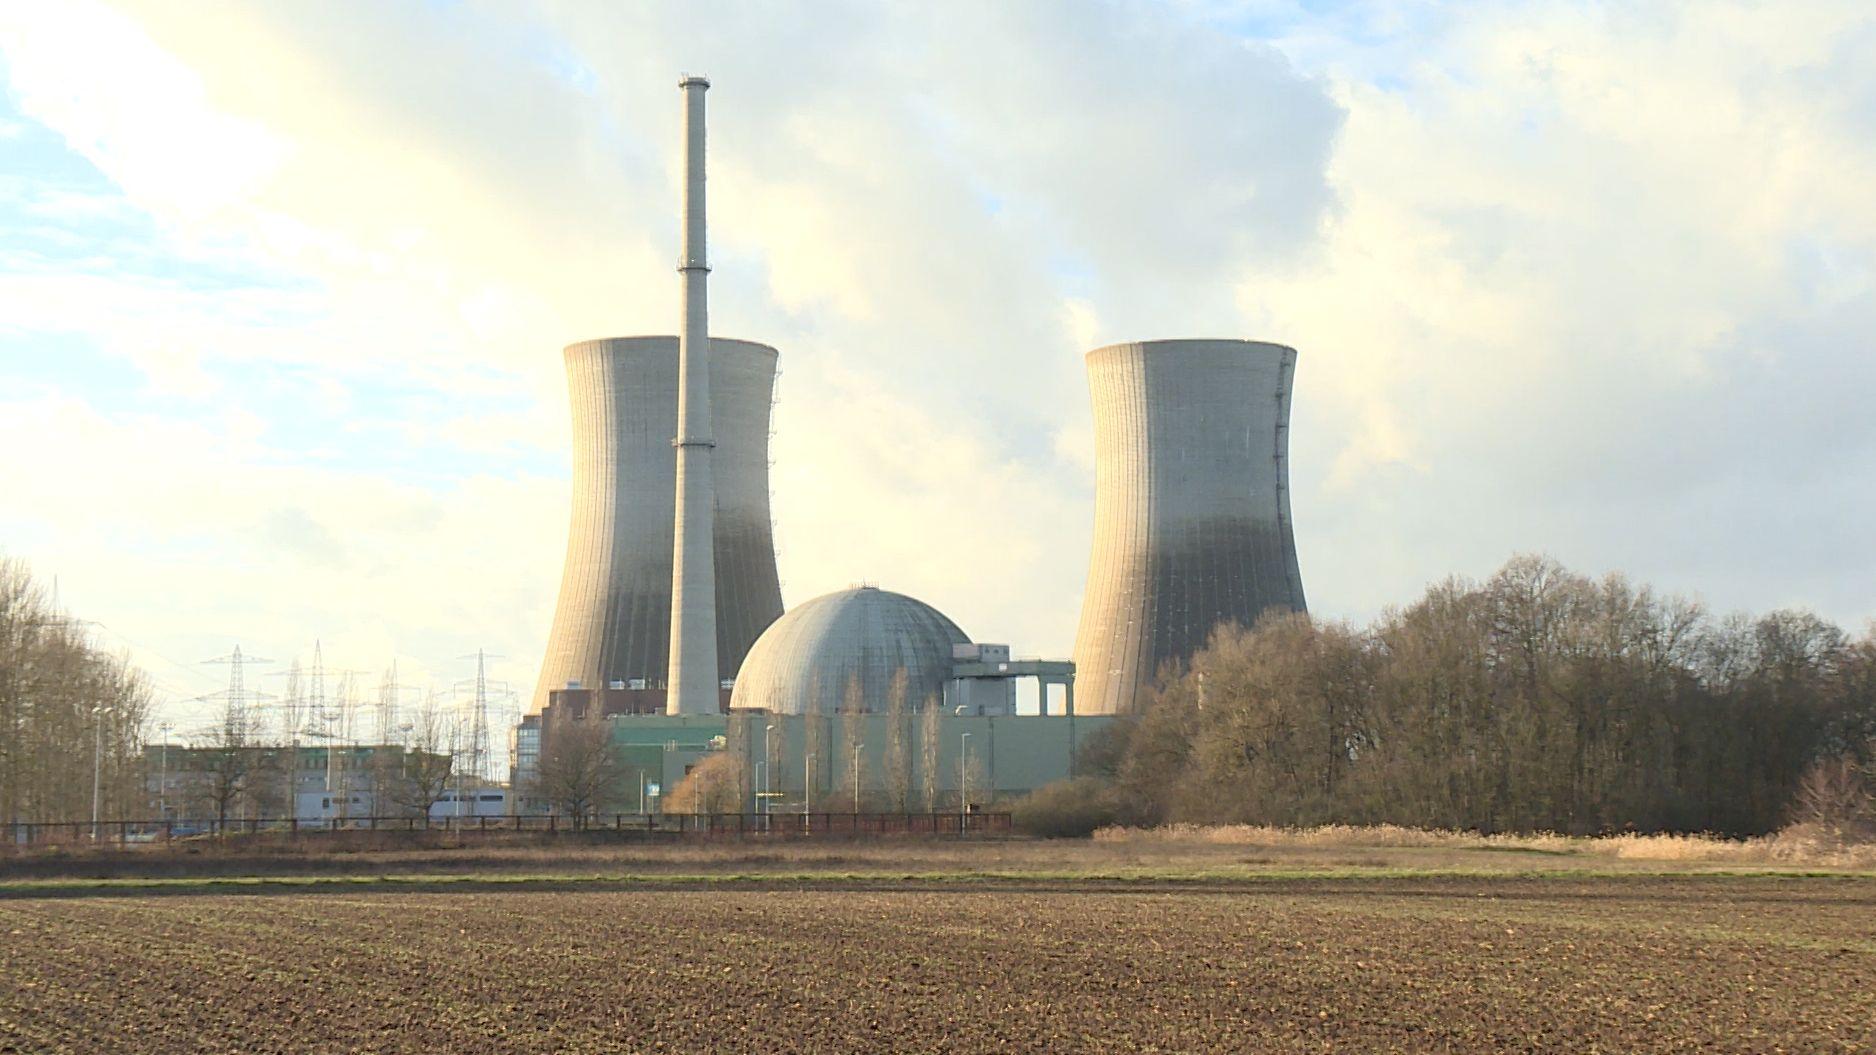 Das Kernkraftwerk Grafenrheinfeld